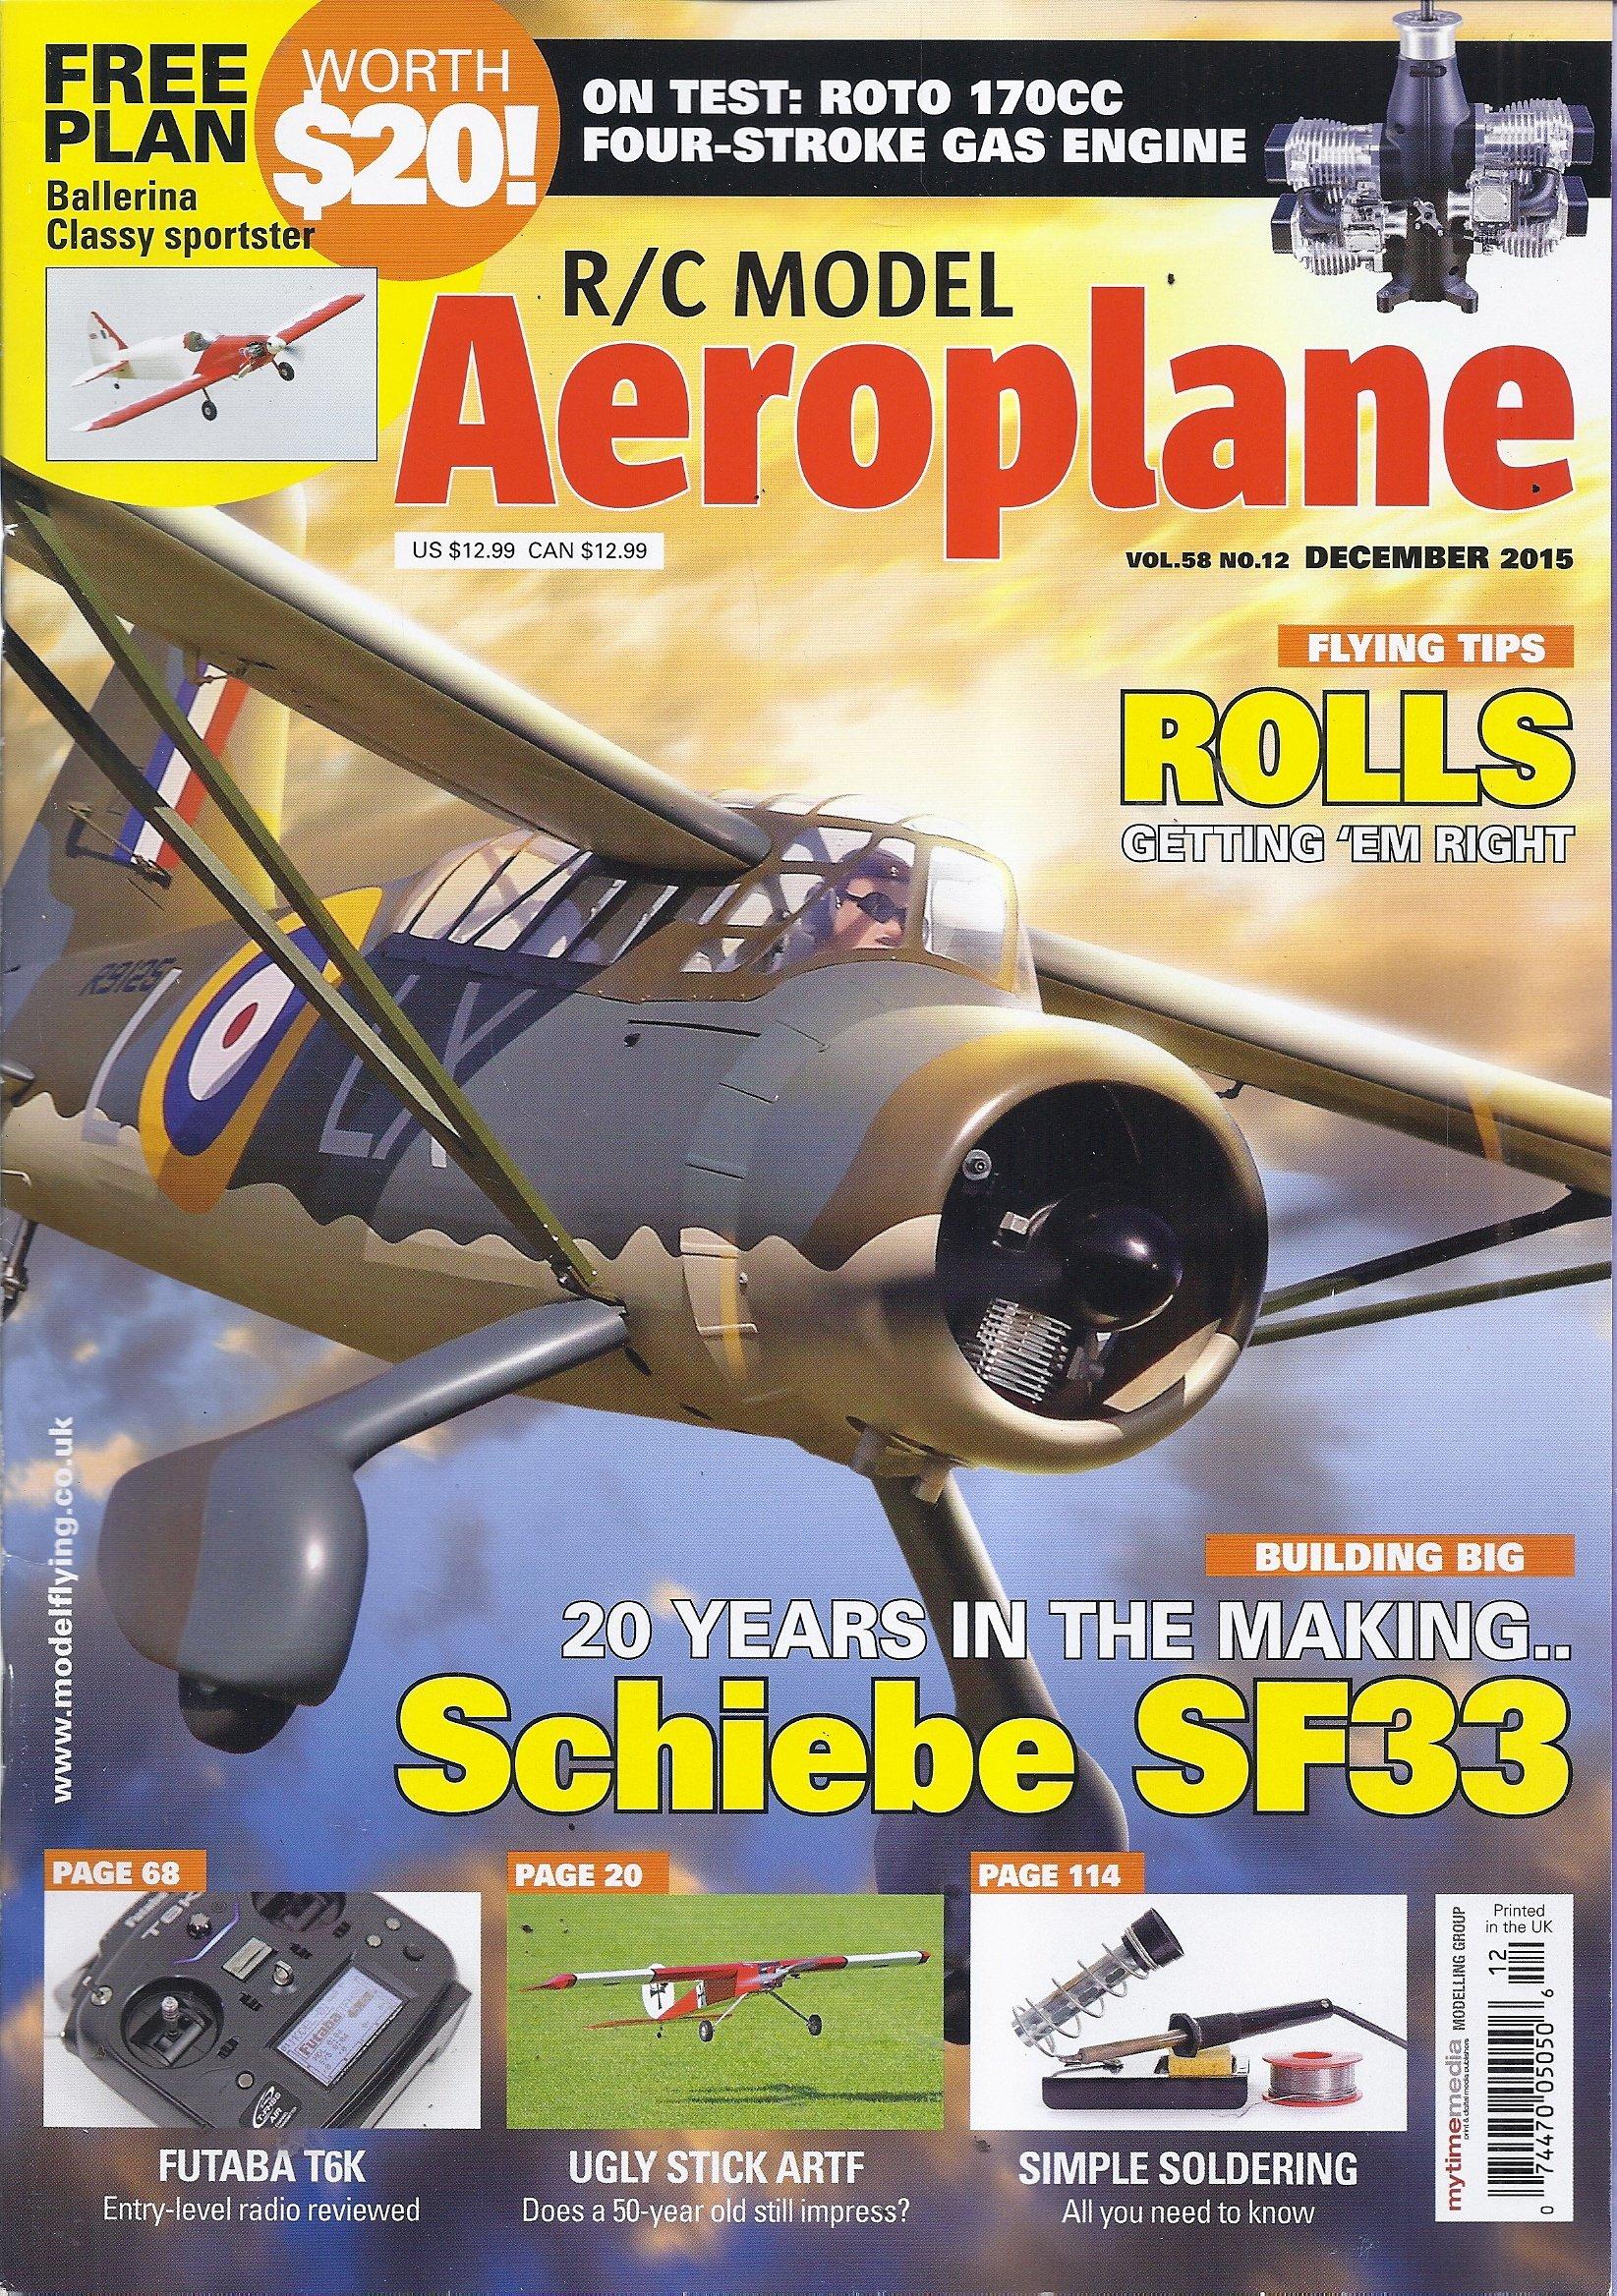 Read Online R/C Model Aeroplane Magazine (December 2015 - Includes Free plan) pdf epub